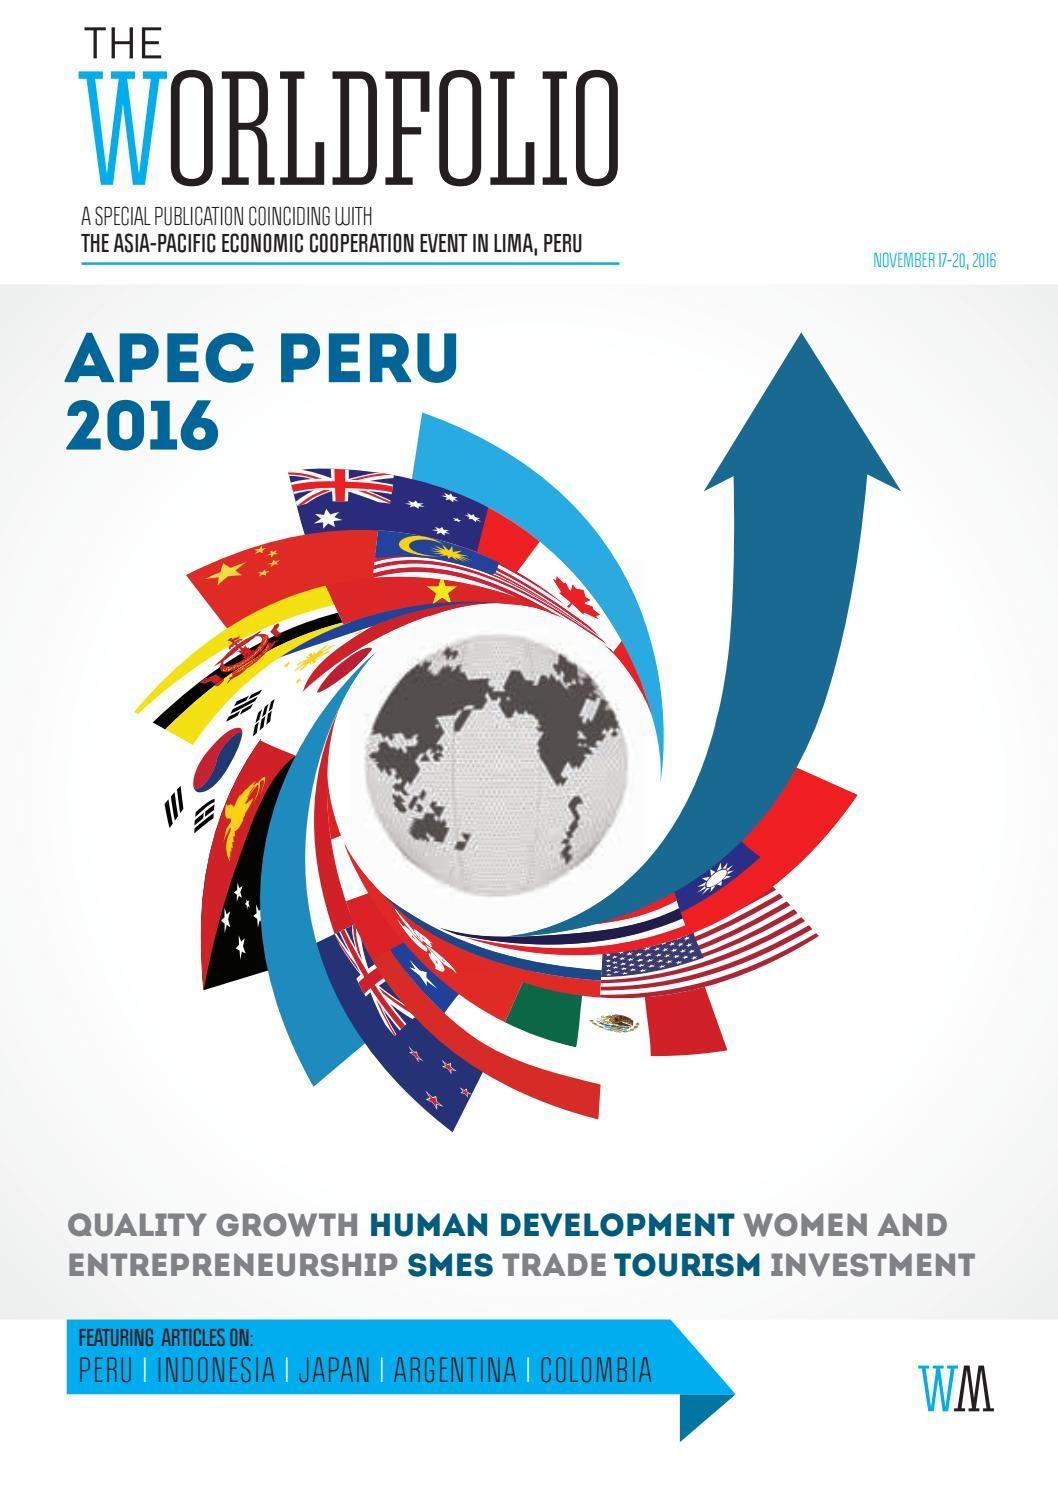 apec peru 2016 by the worldfolio issuu